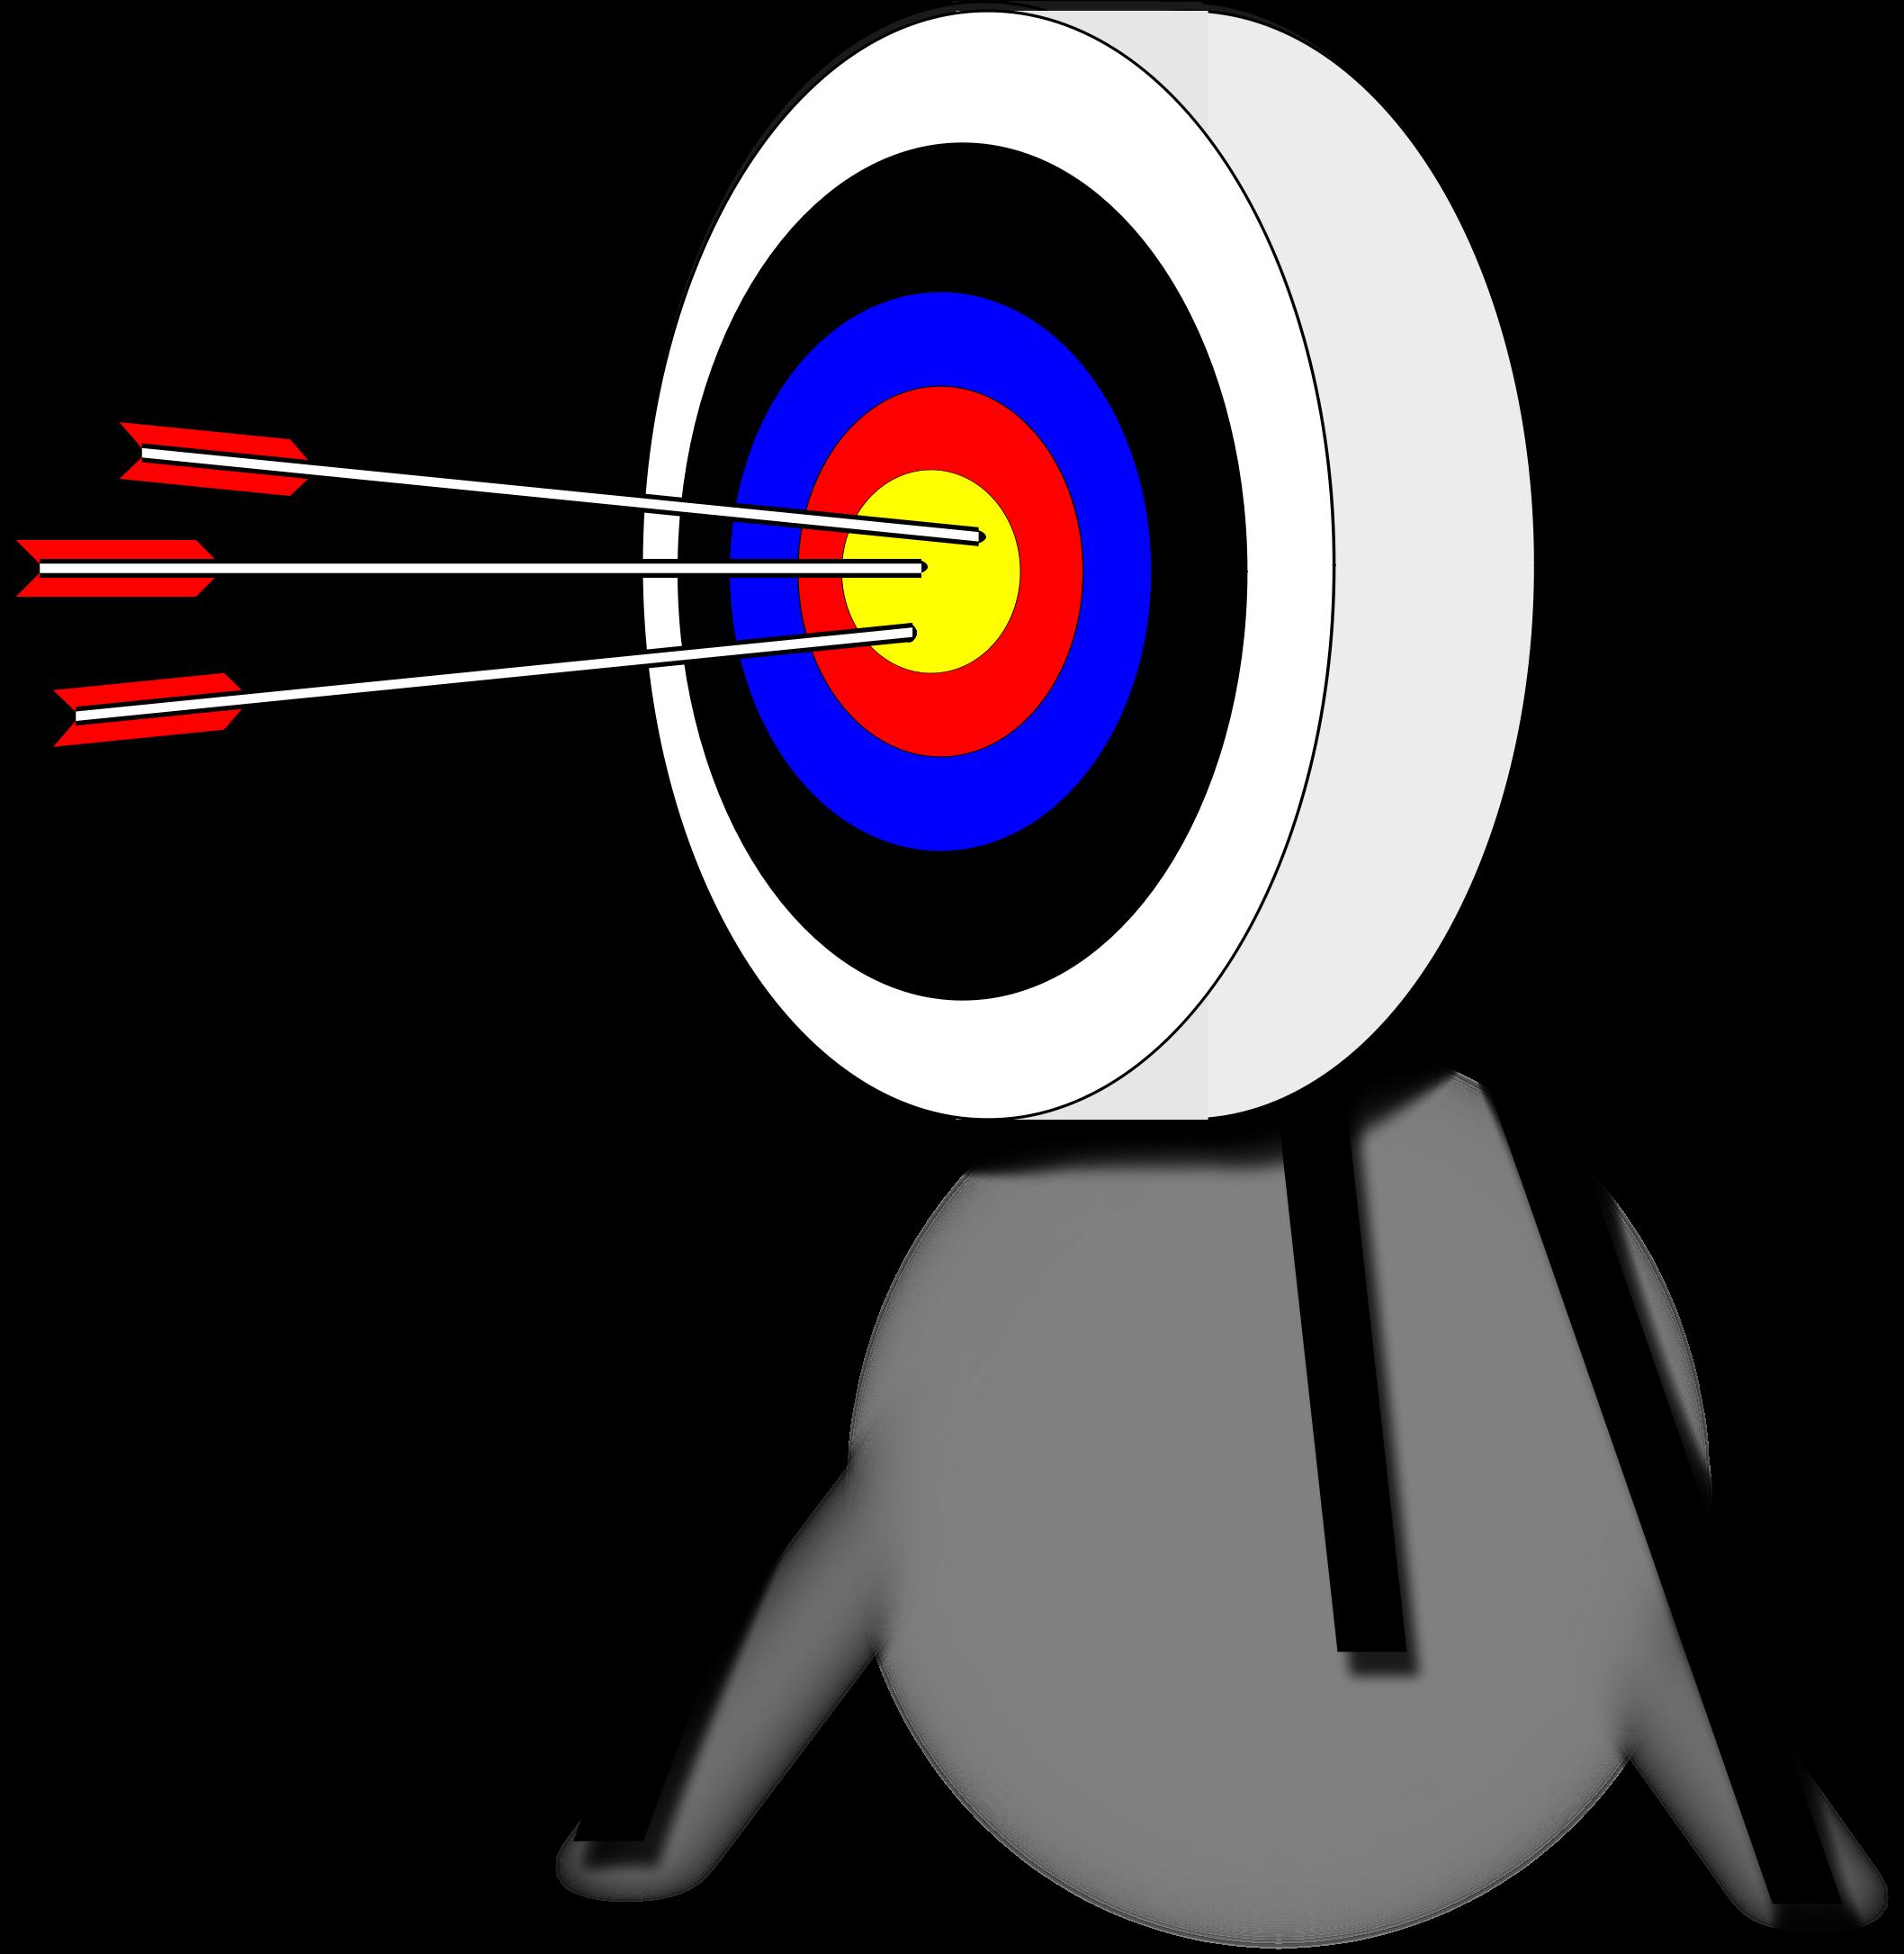 Bullseye clipart target clipart. Archery cilpart exclusive